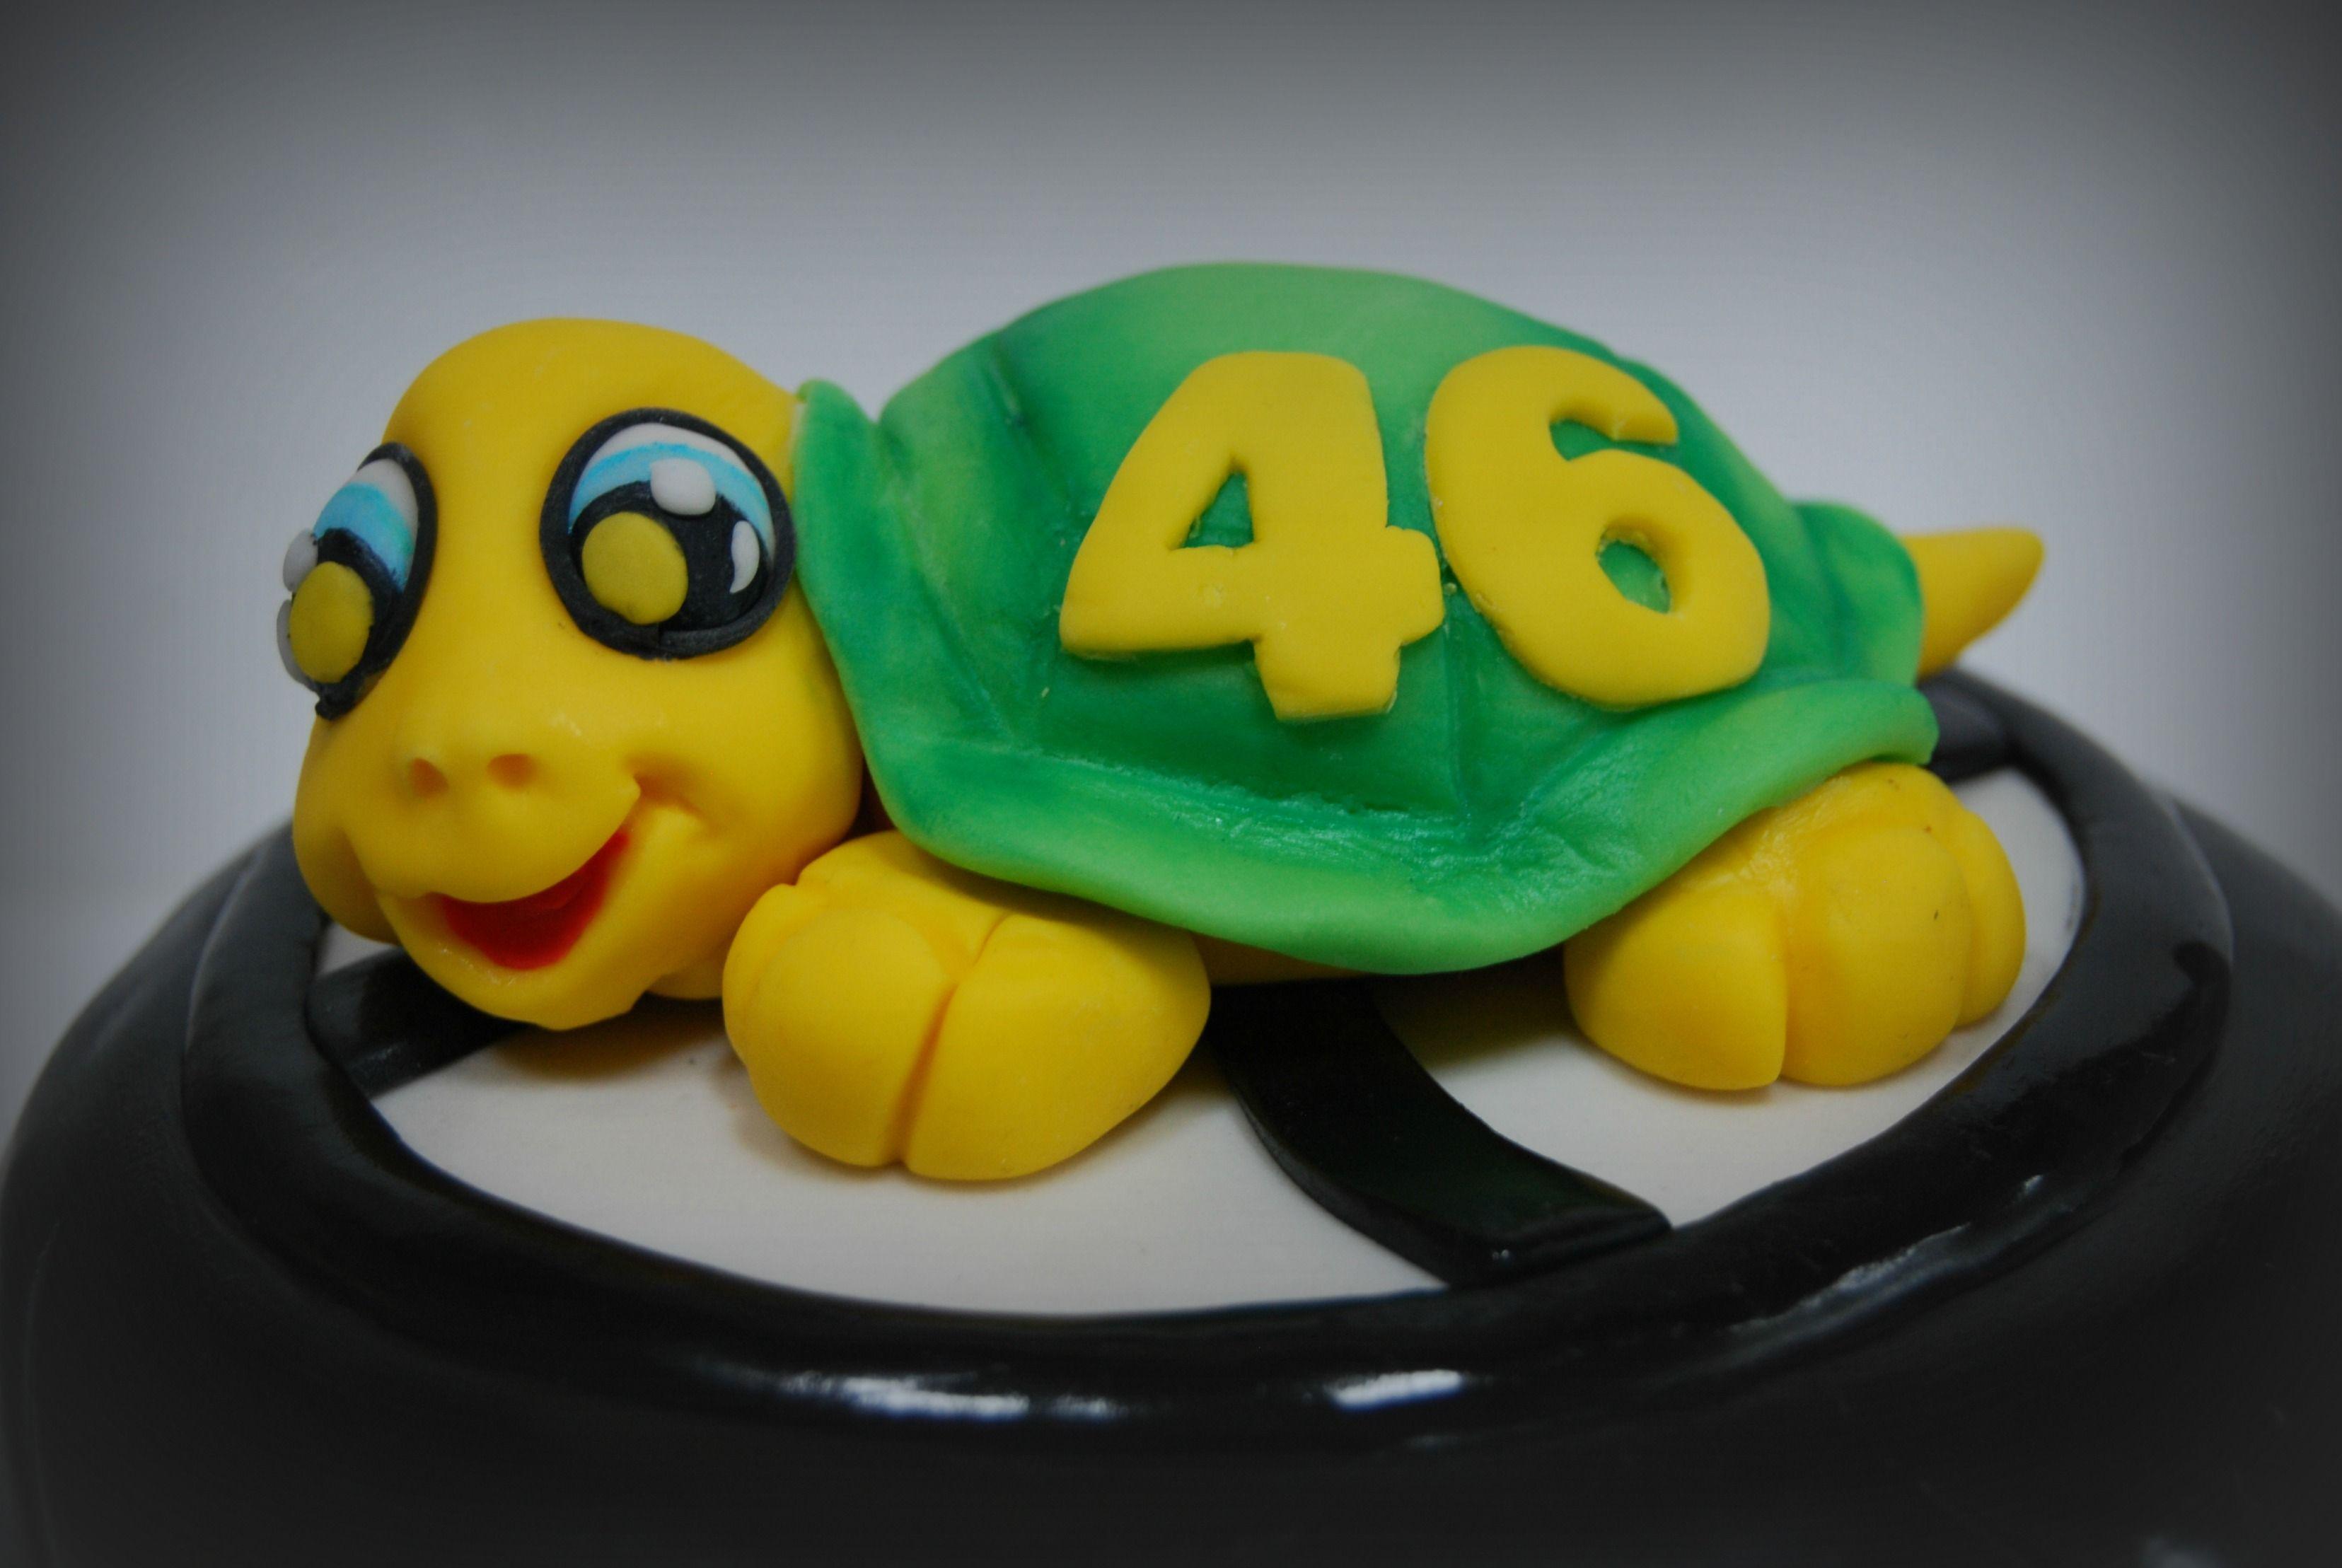 Valentino Rossi Cake